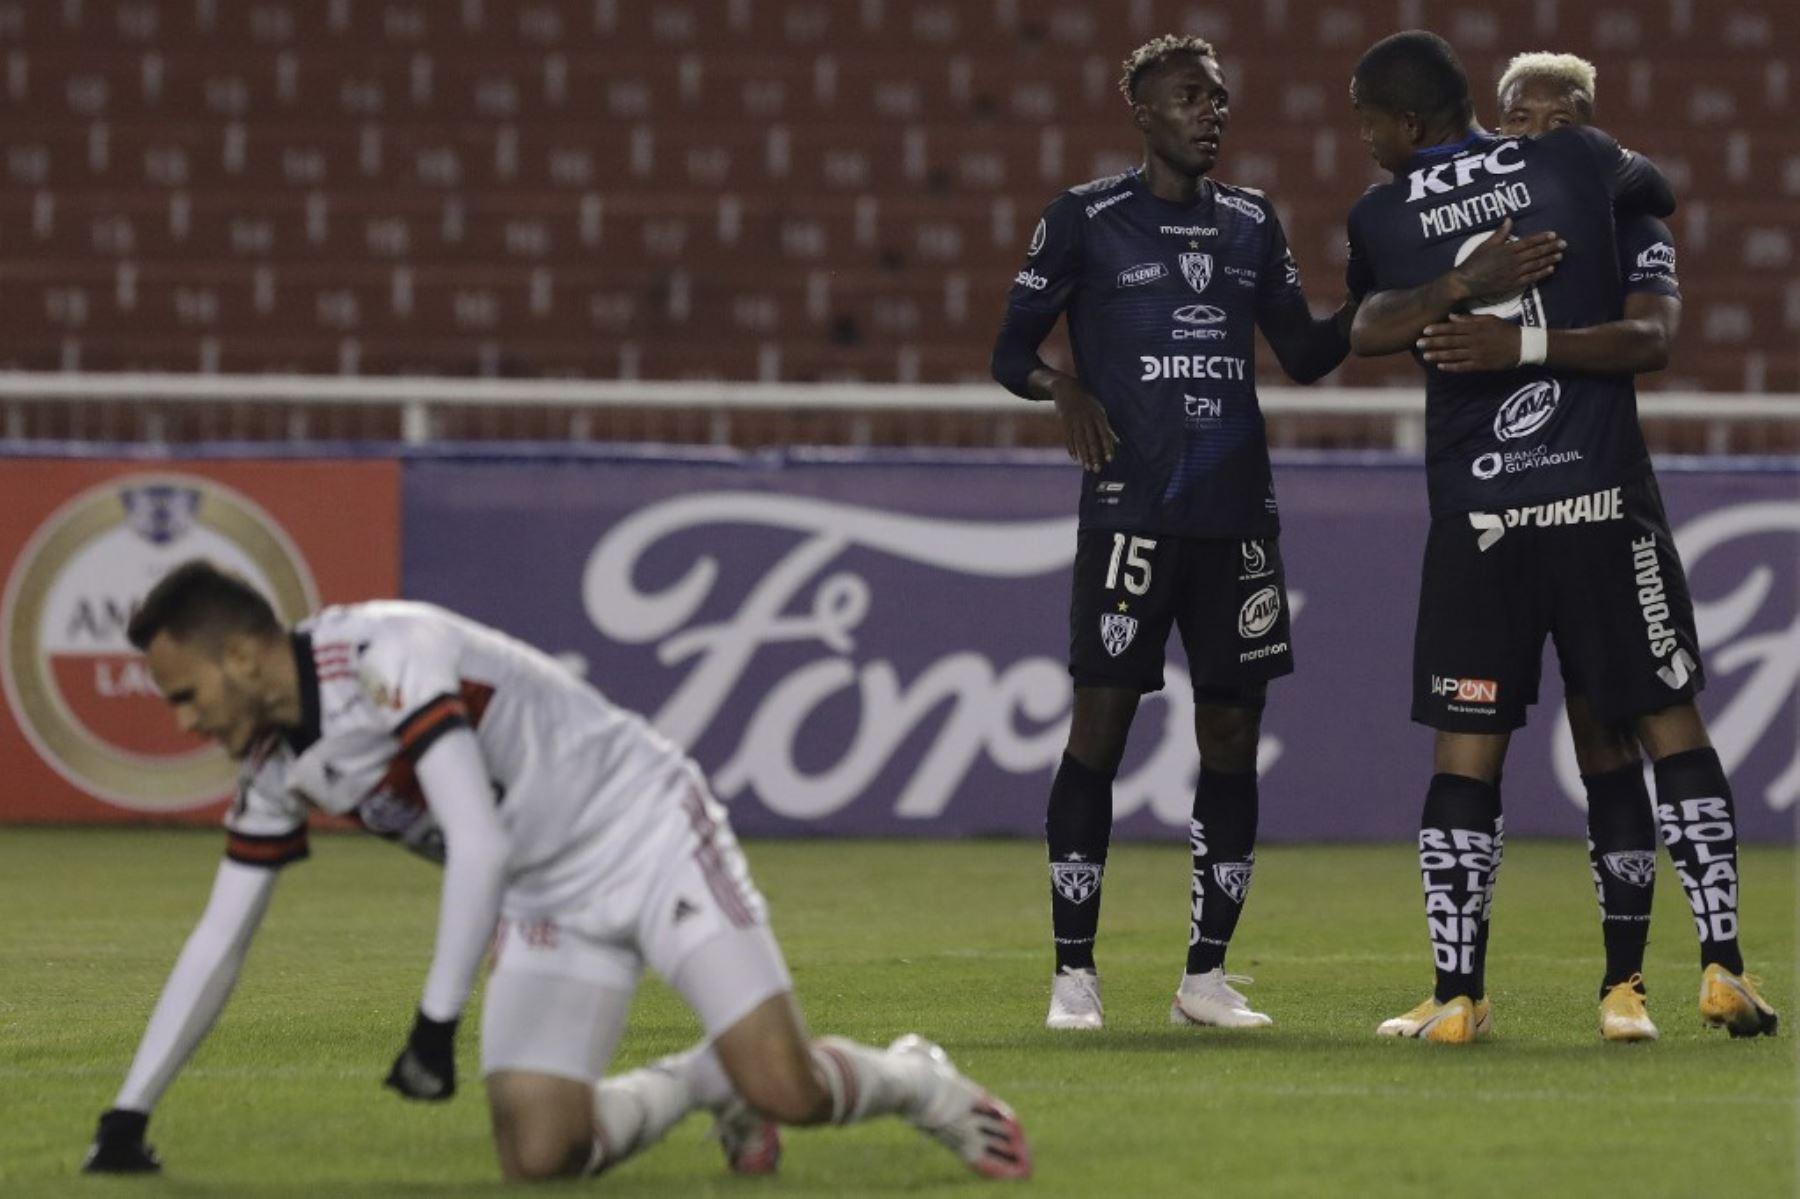 FOTO) Reacción de medios brasileños ante goleada de IDV a Flamengo | ECUAGOL